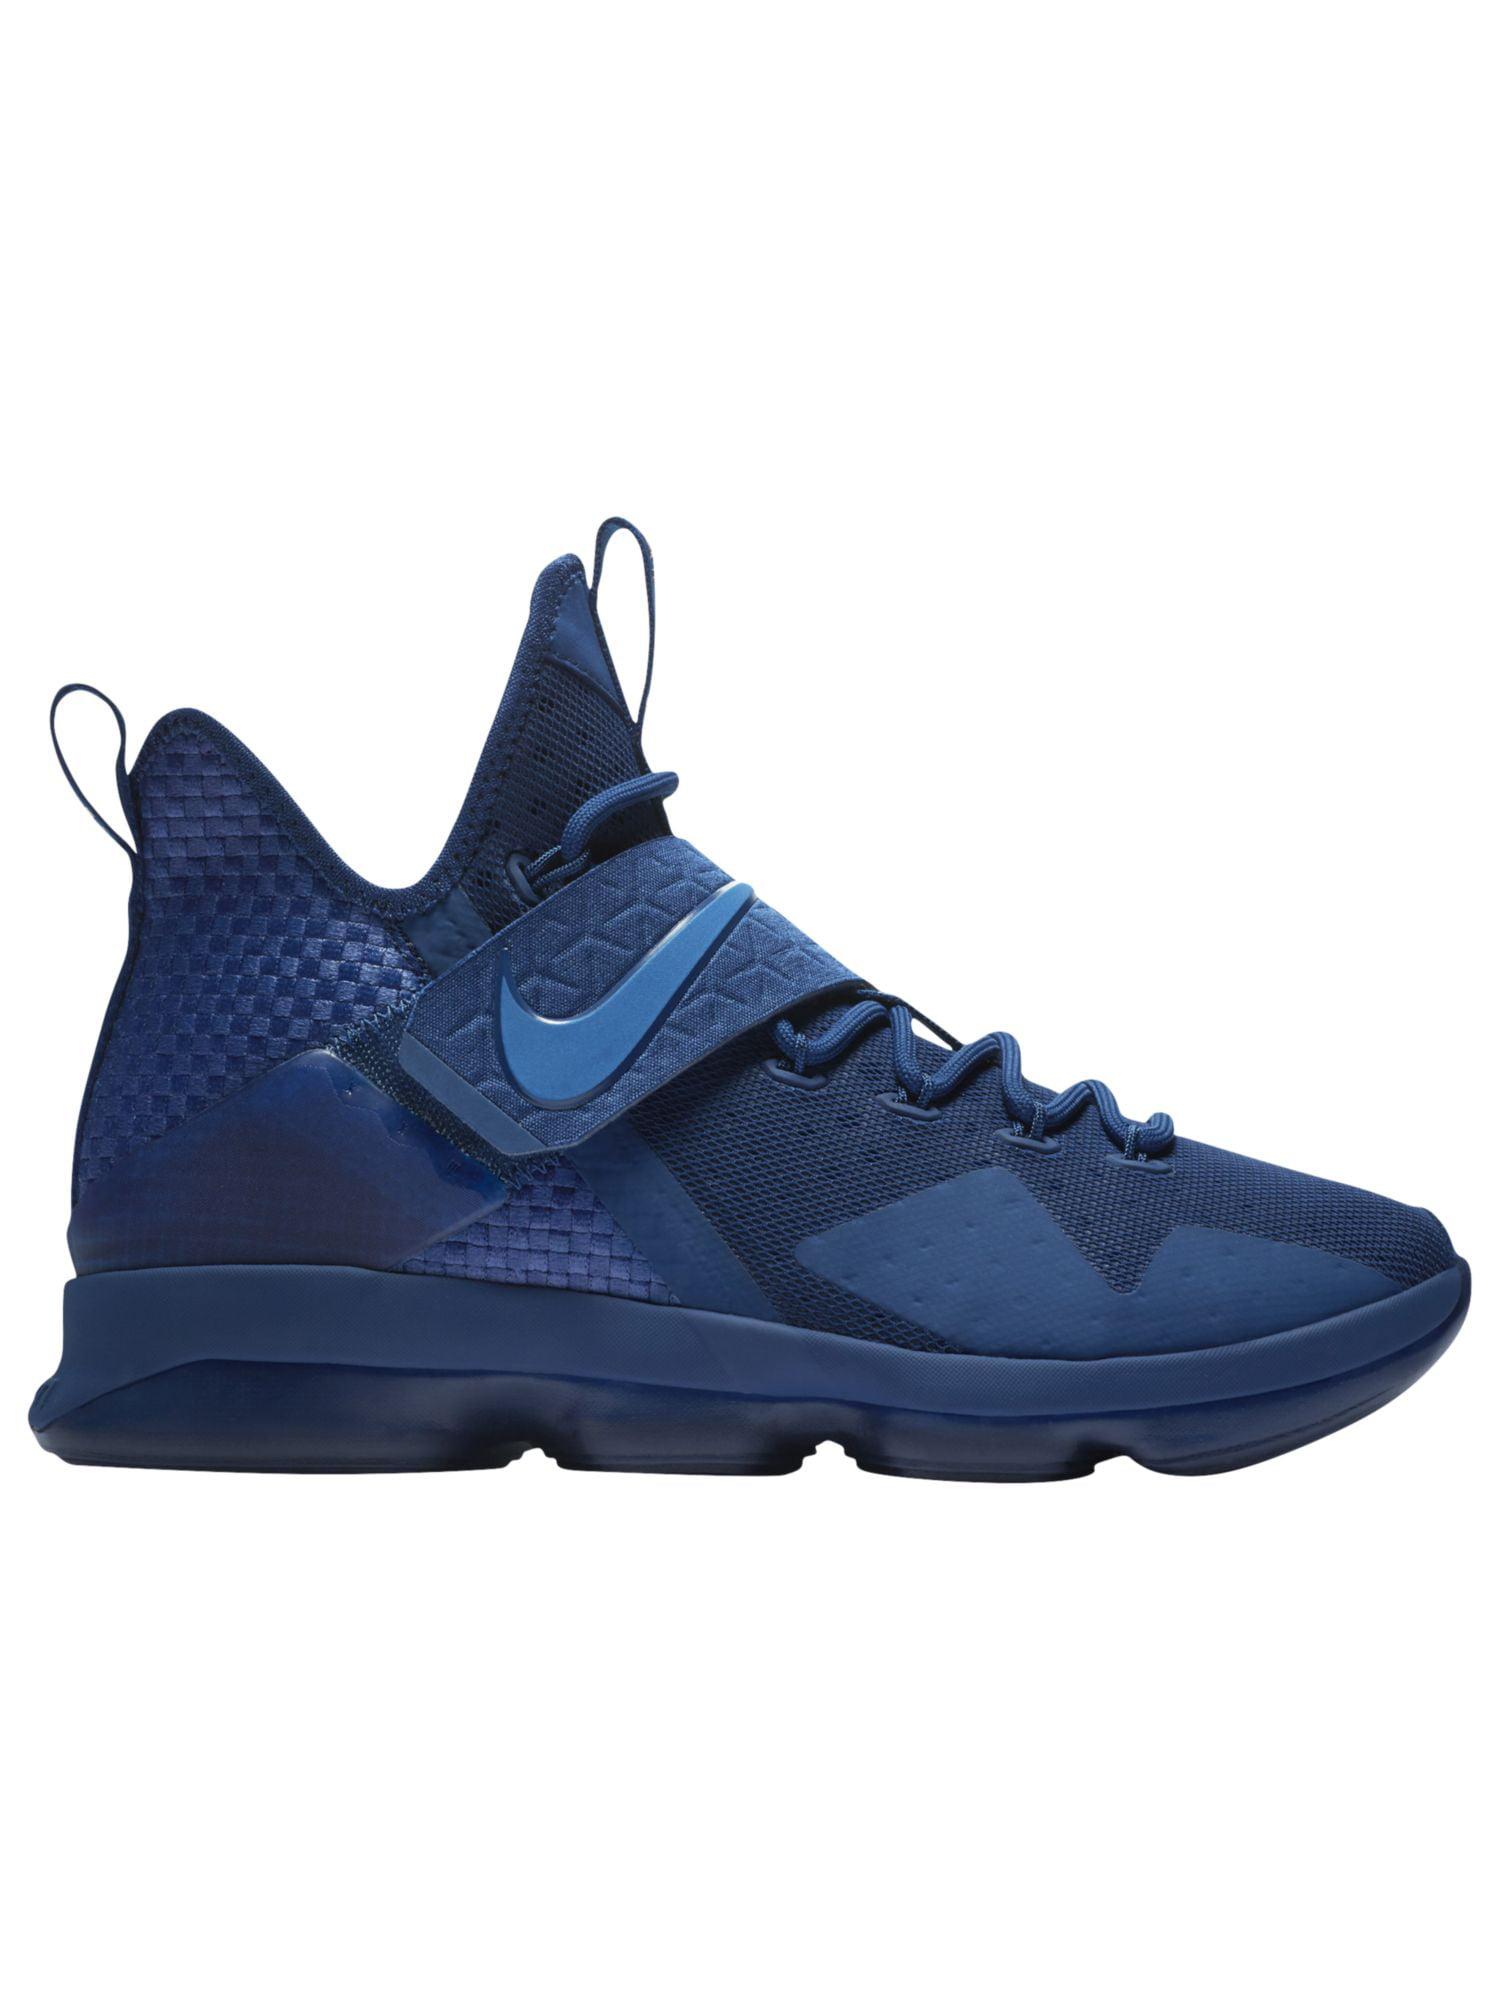 15de1ba56a9d ... order nike lebron 14 lmtd mens basketball shoes james lebron coastal  blue white star 12dcf 2bb21